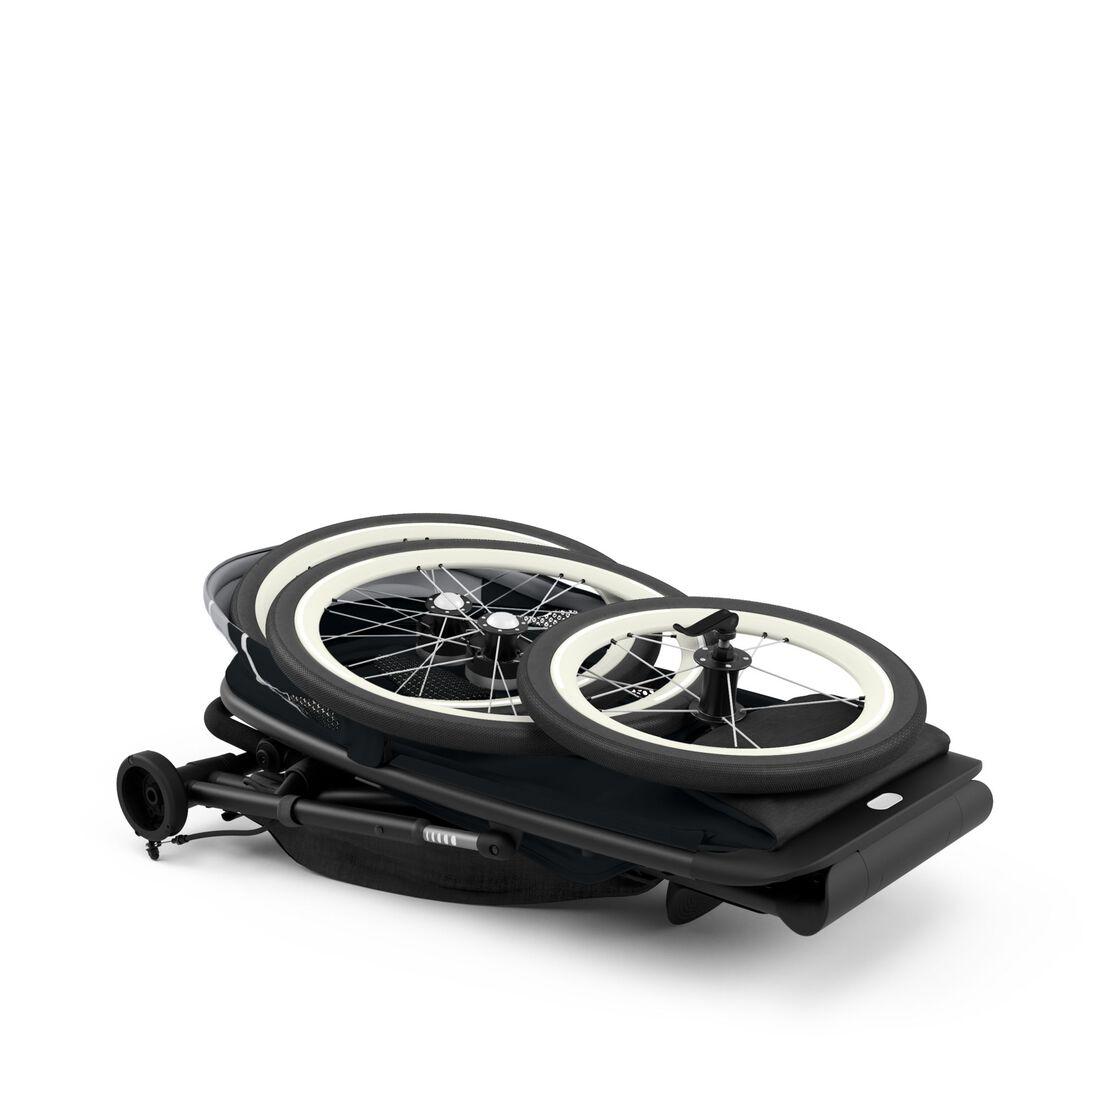 CYBEX Avi One Box - All Black in All Black large Bild 7